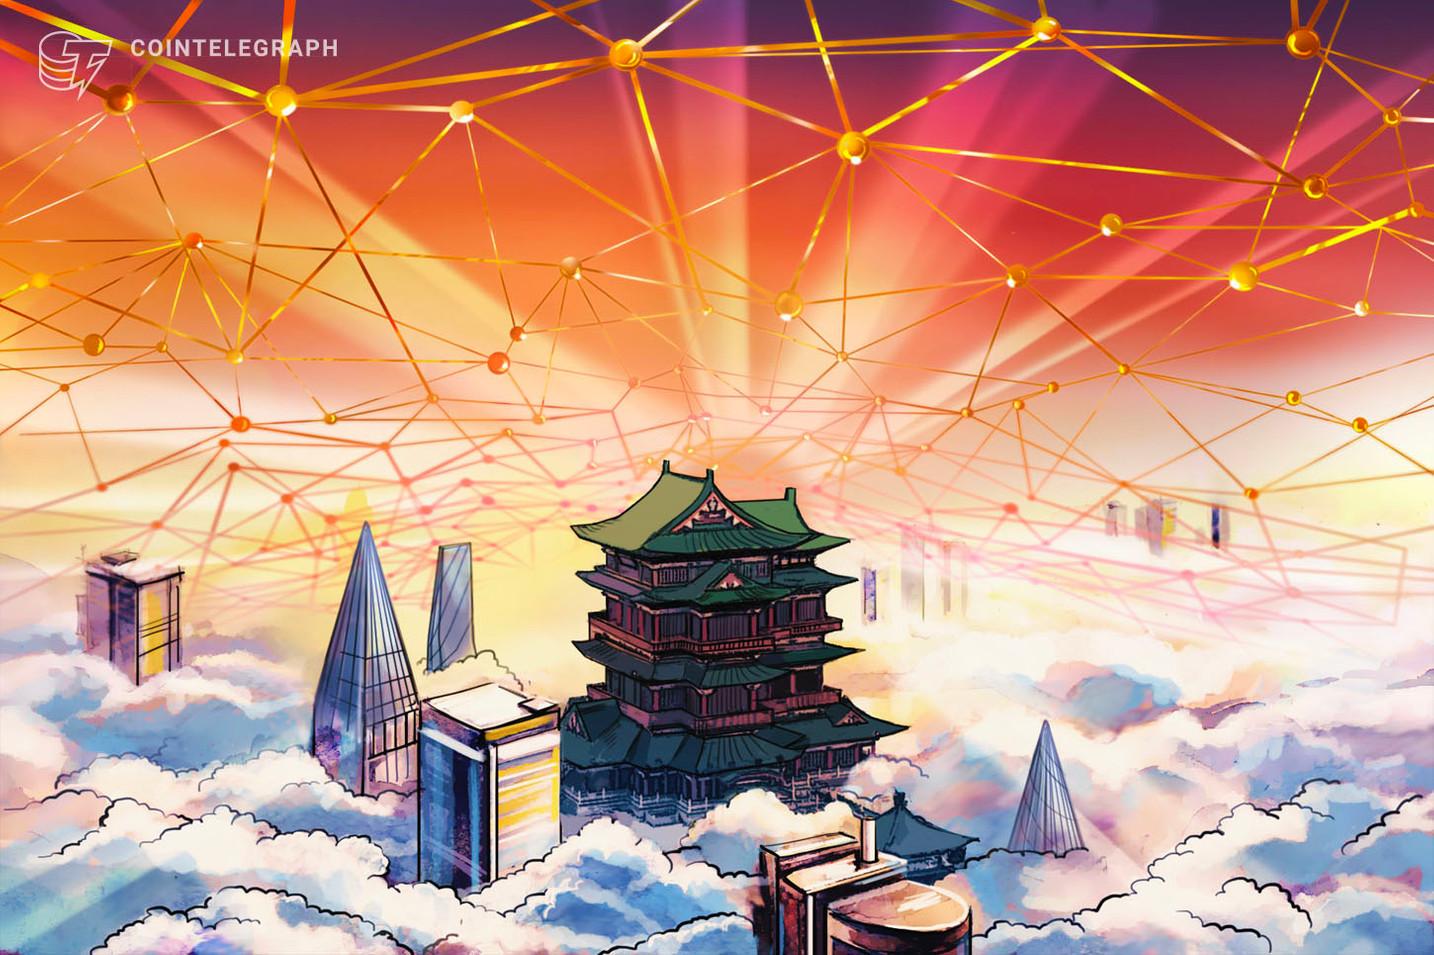 Çin Komunist Partisi'nin Gündeminde Blockchain Var